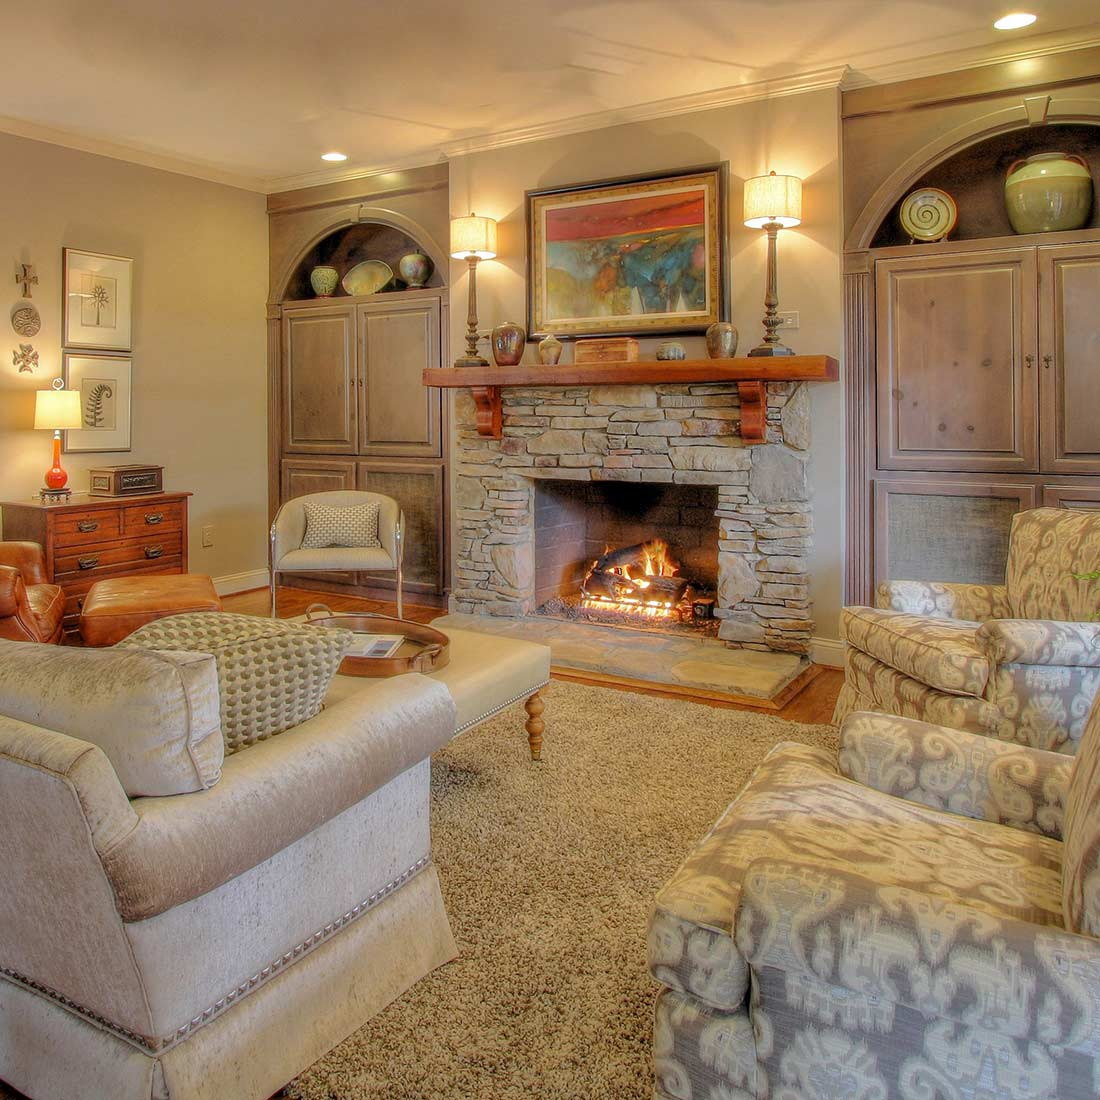 David Watkins Designs Interior Design In Greenville Sc